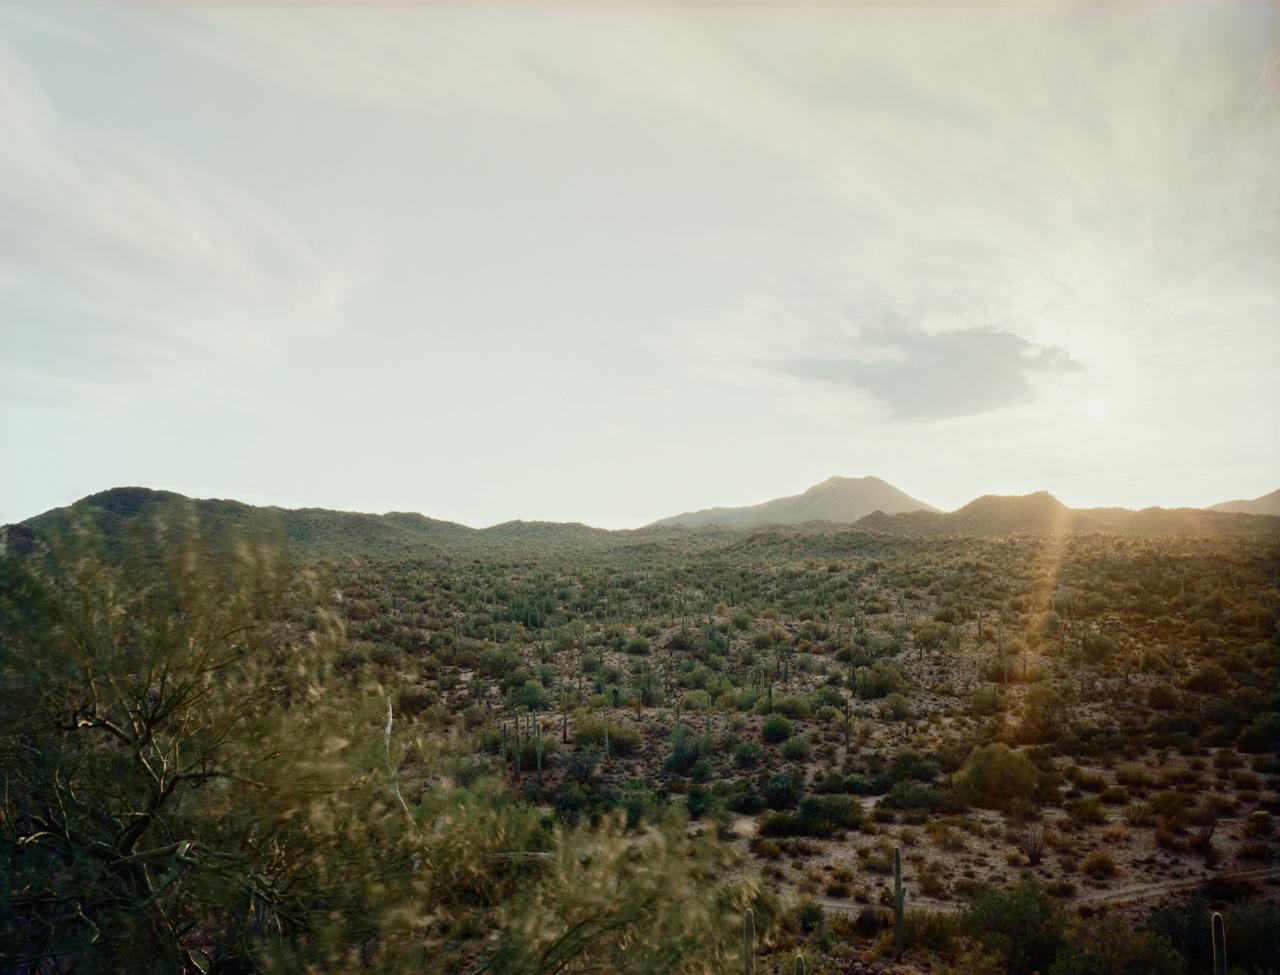 Sun Stretch, Thirteen Minutes, Tohono O'odham Nation, Arizona